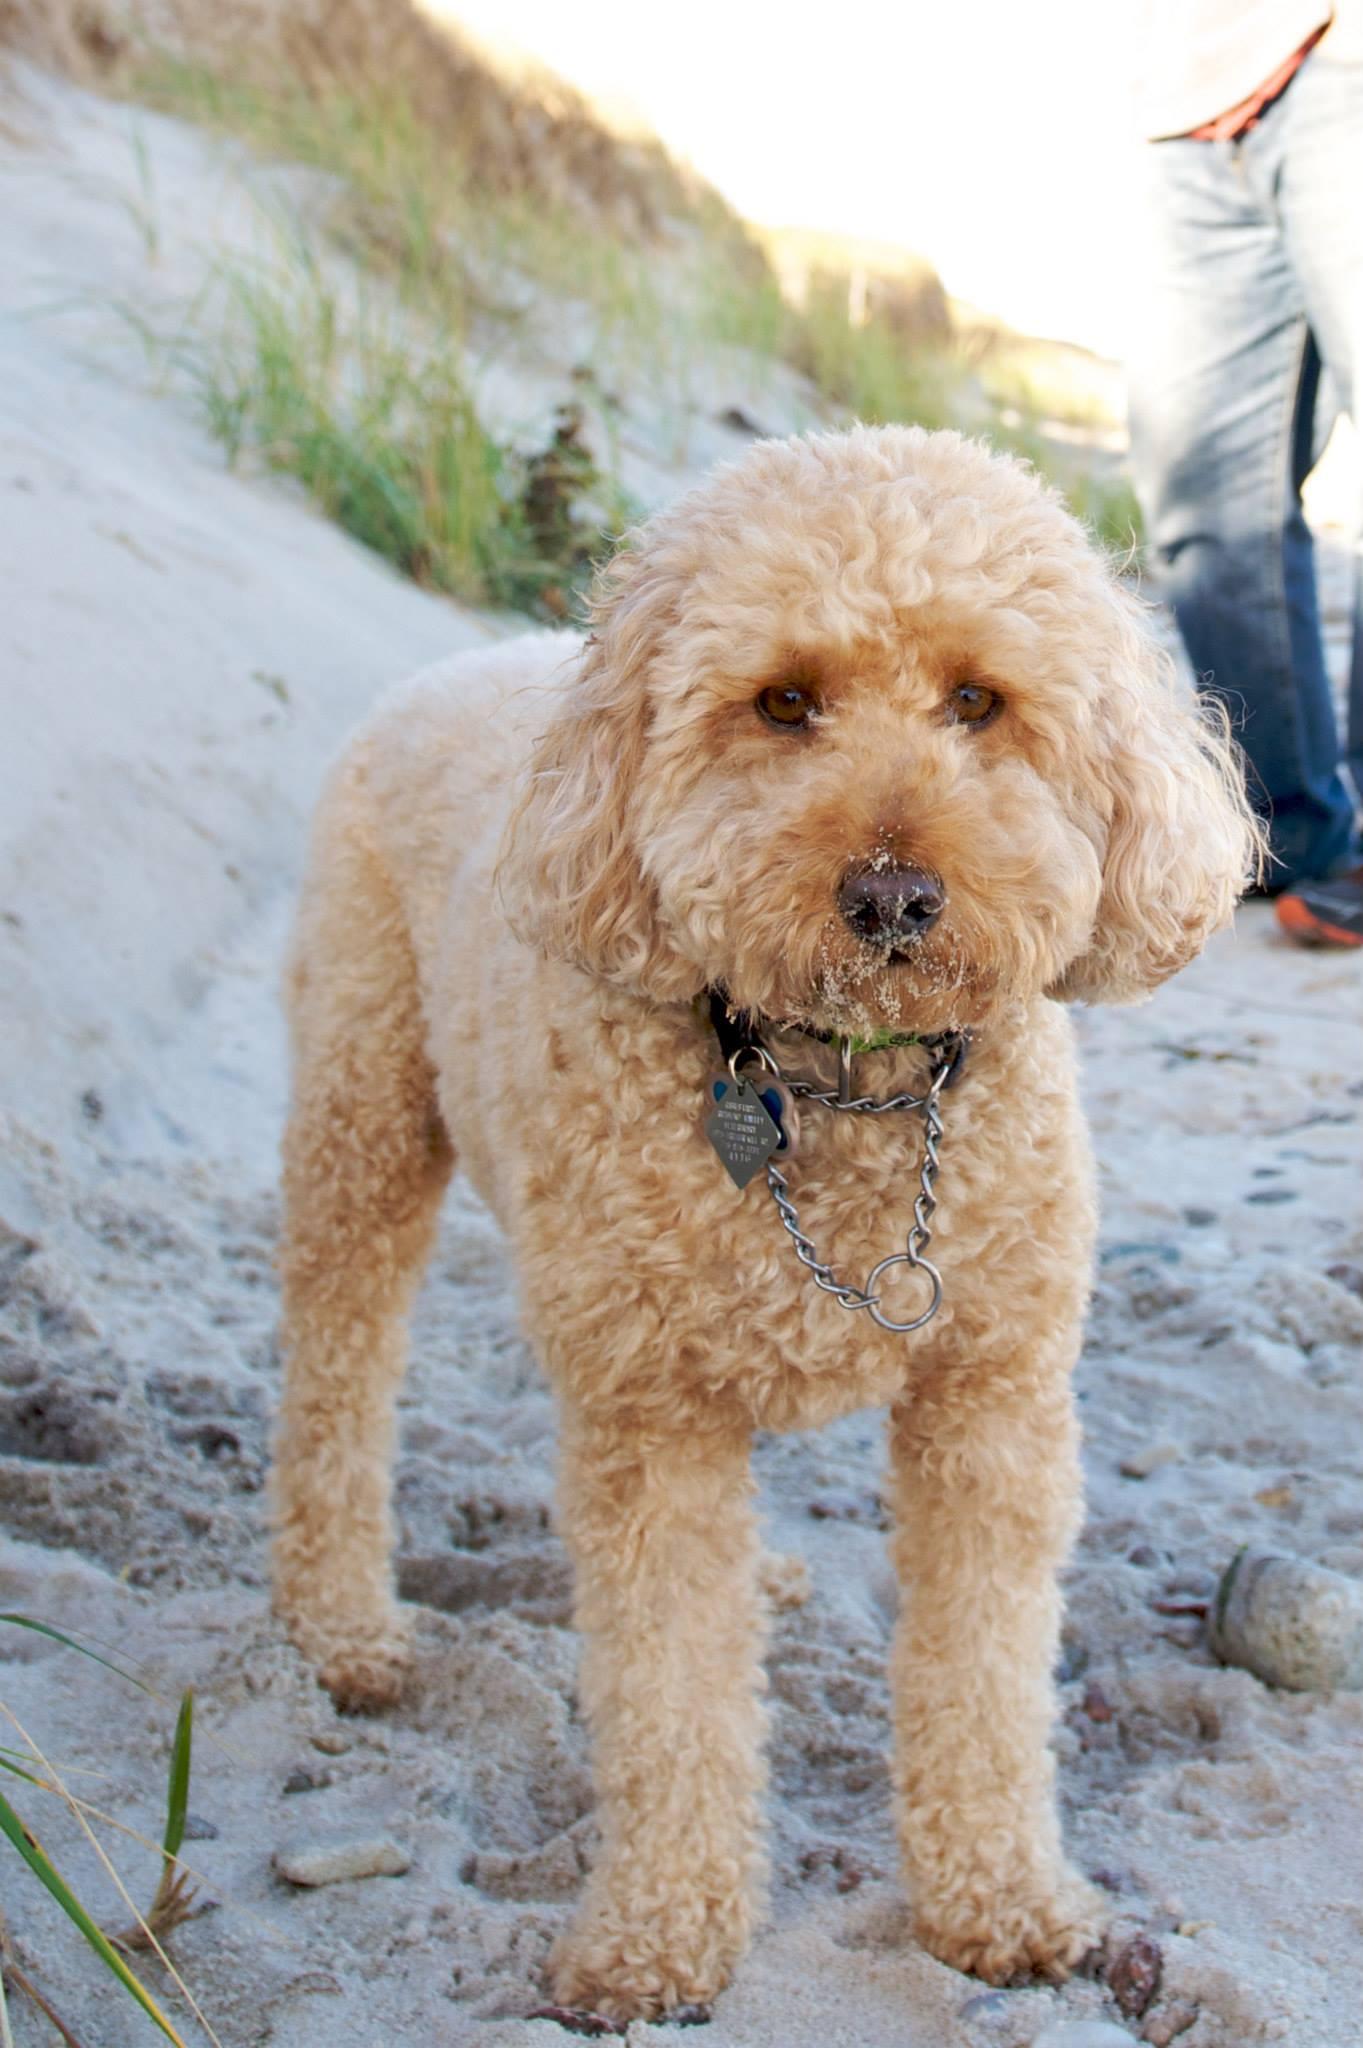 Ma, I got sand on my nose